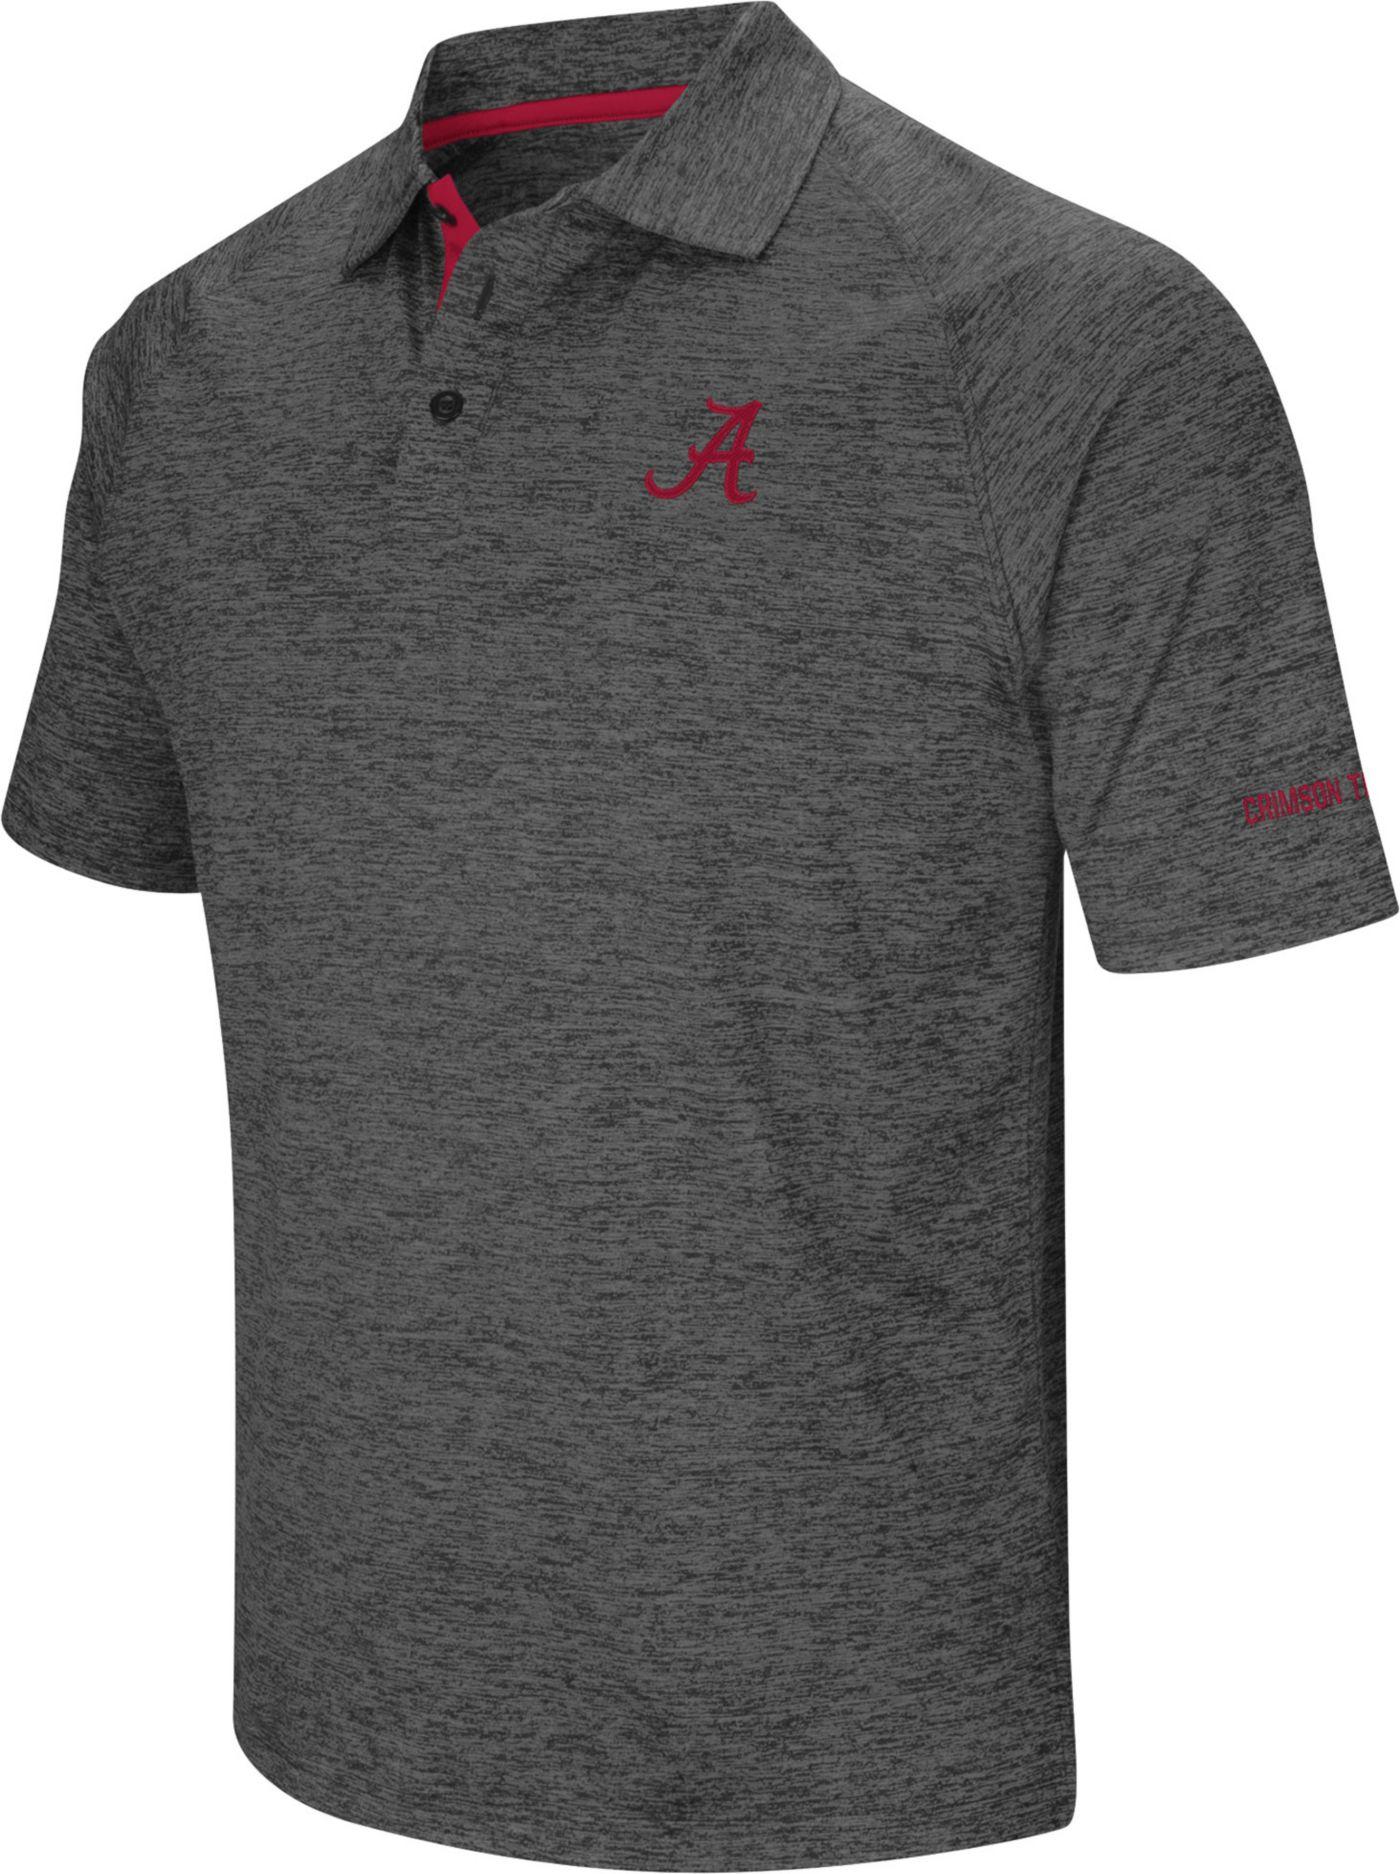 Colosseum Men's Alabama Crimson Tide Grey Downswing Polo